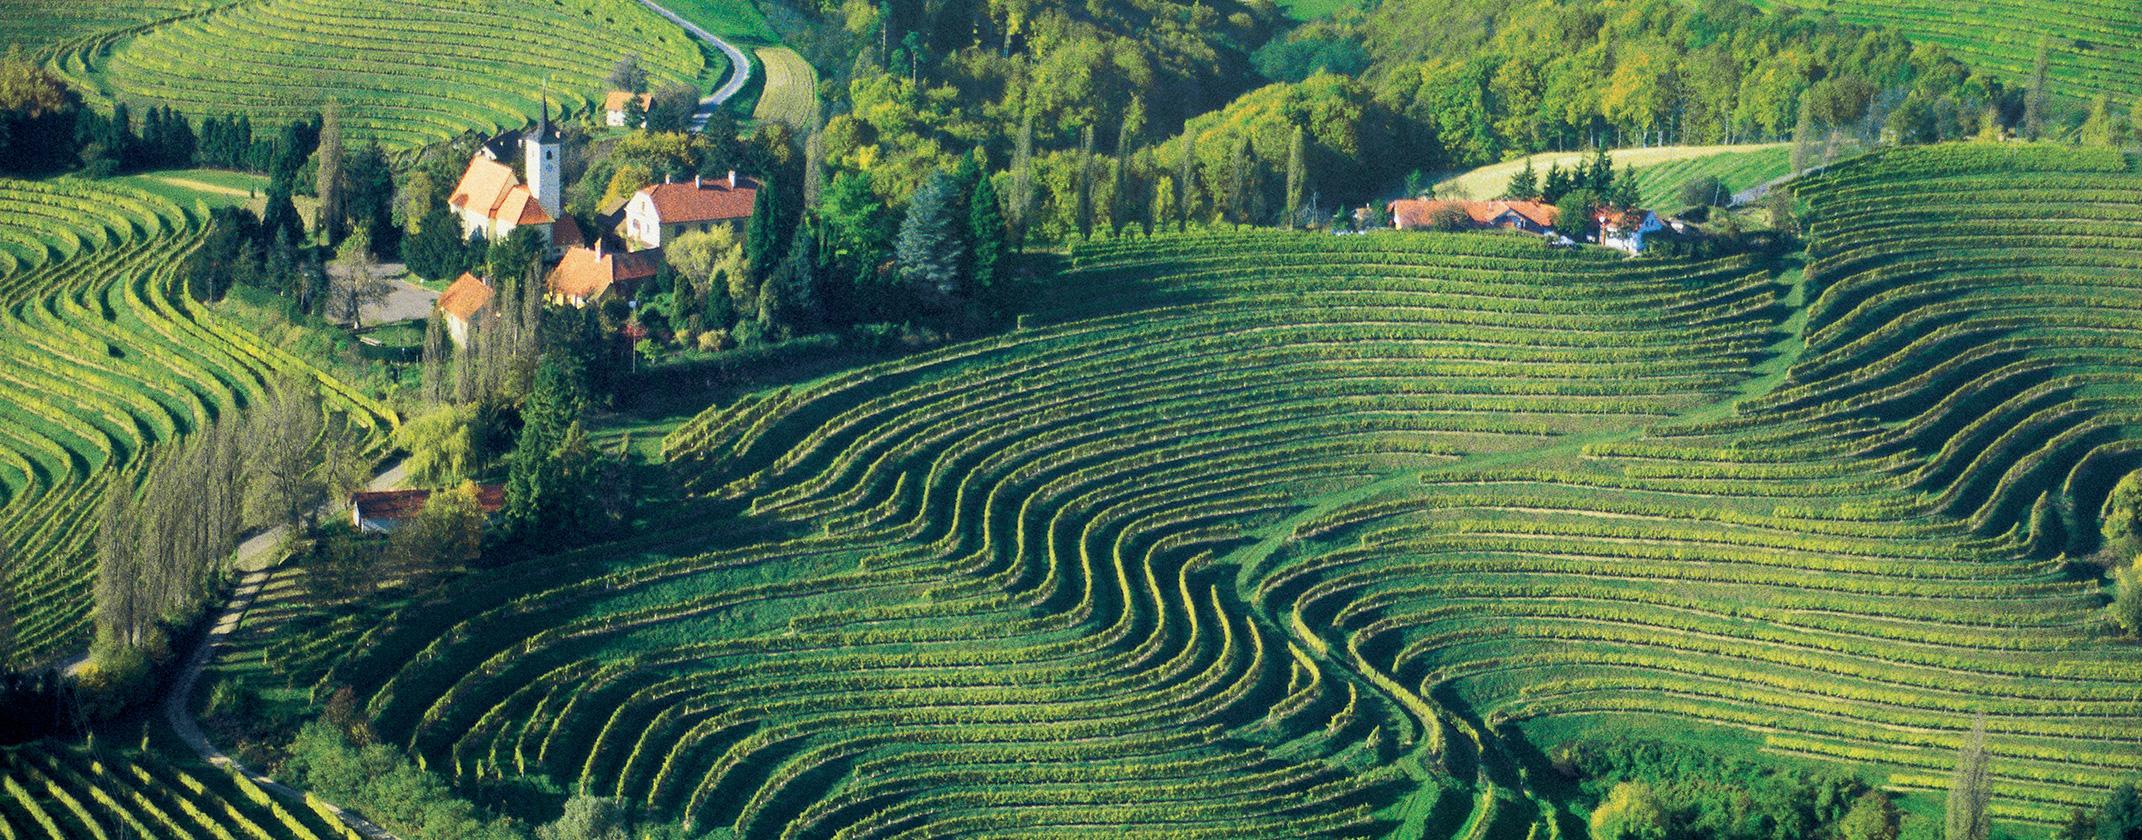 Image result for vinogradi